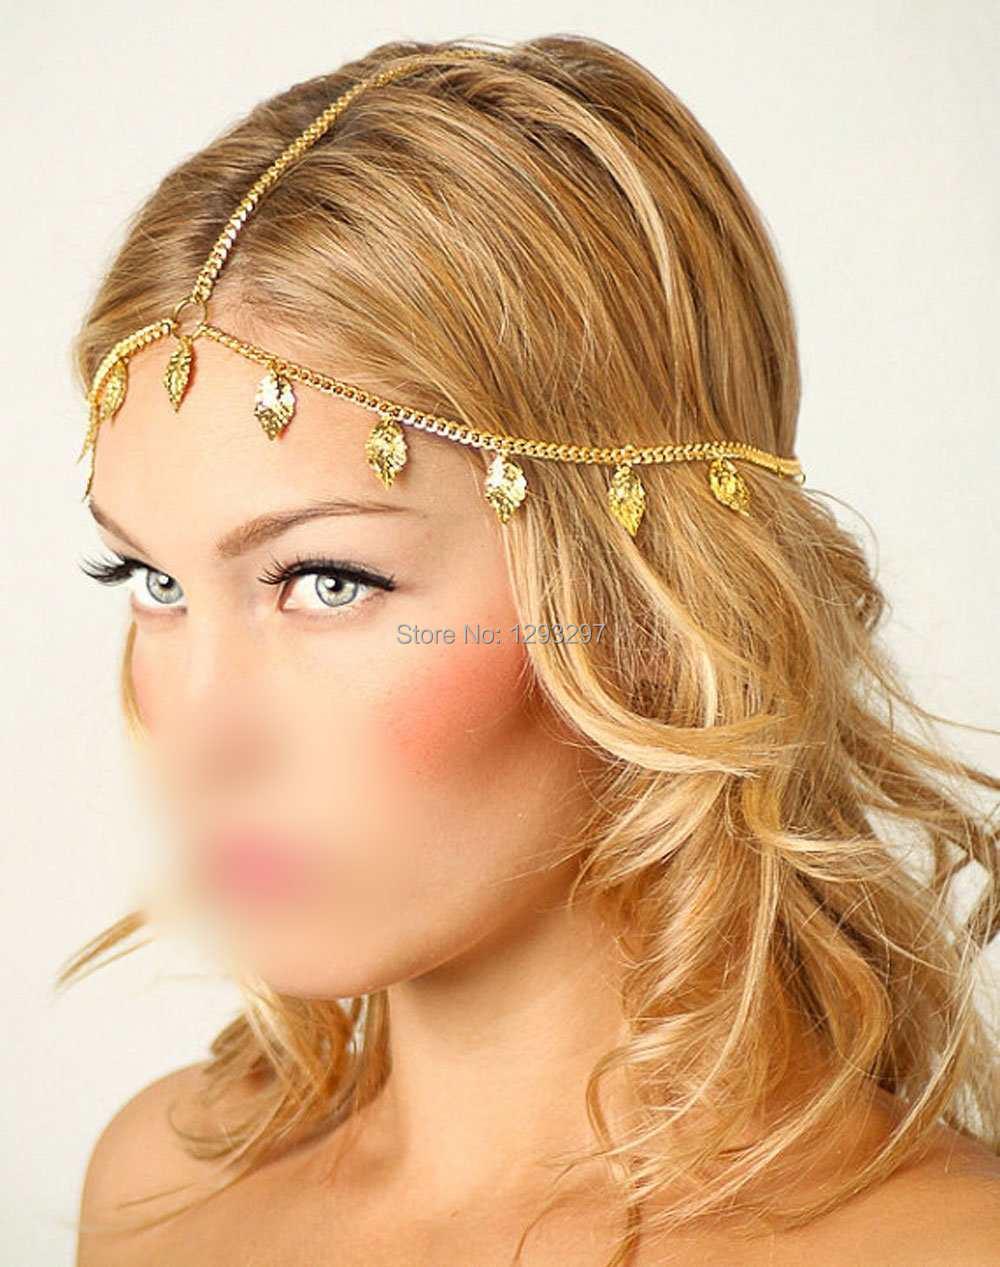 Celebrity Lady Tassel Metal Head Chain Headpiece BOHO Band Hair Headband Jewelry LJML(China (Mainland))